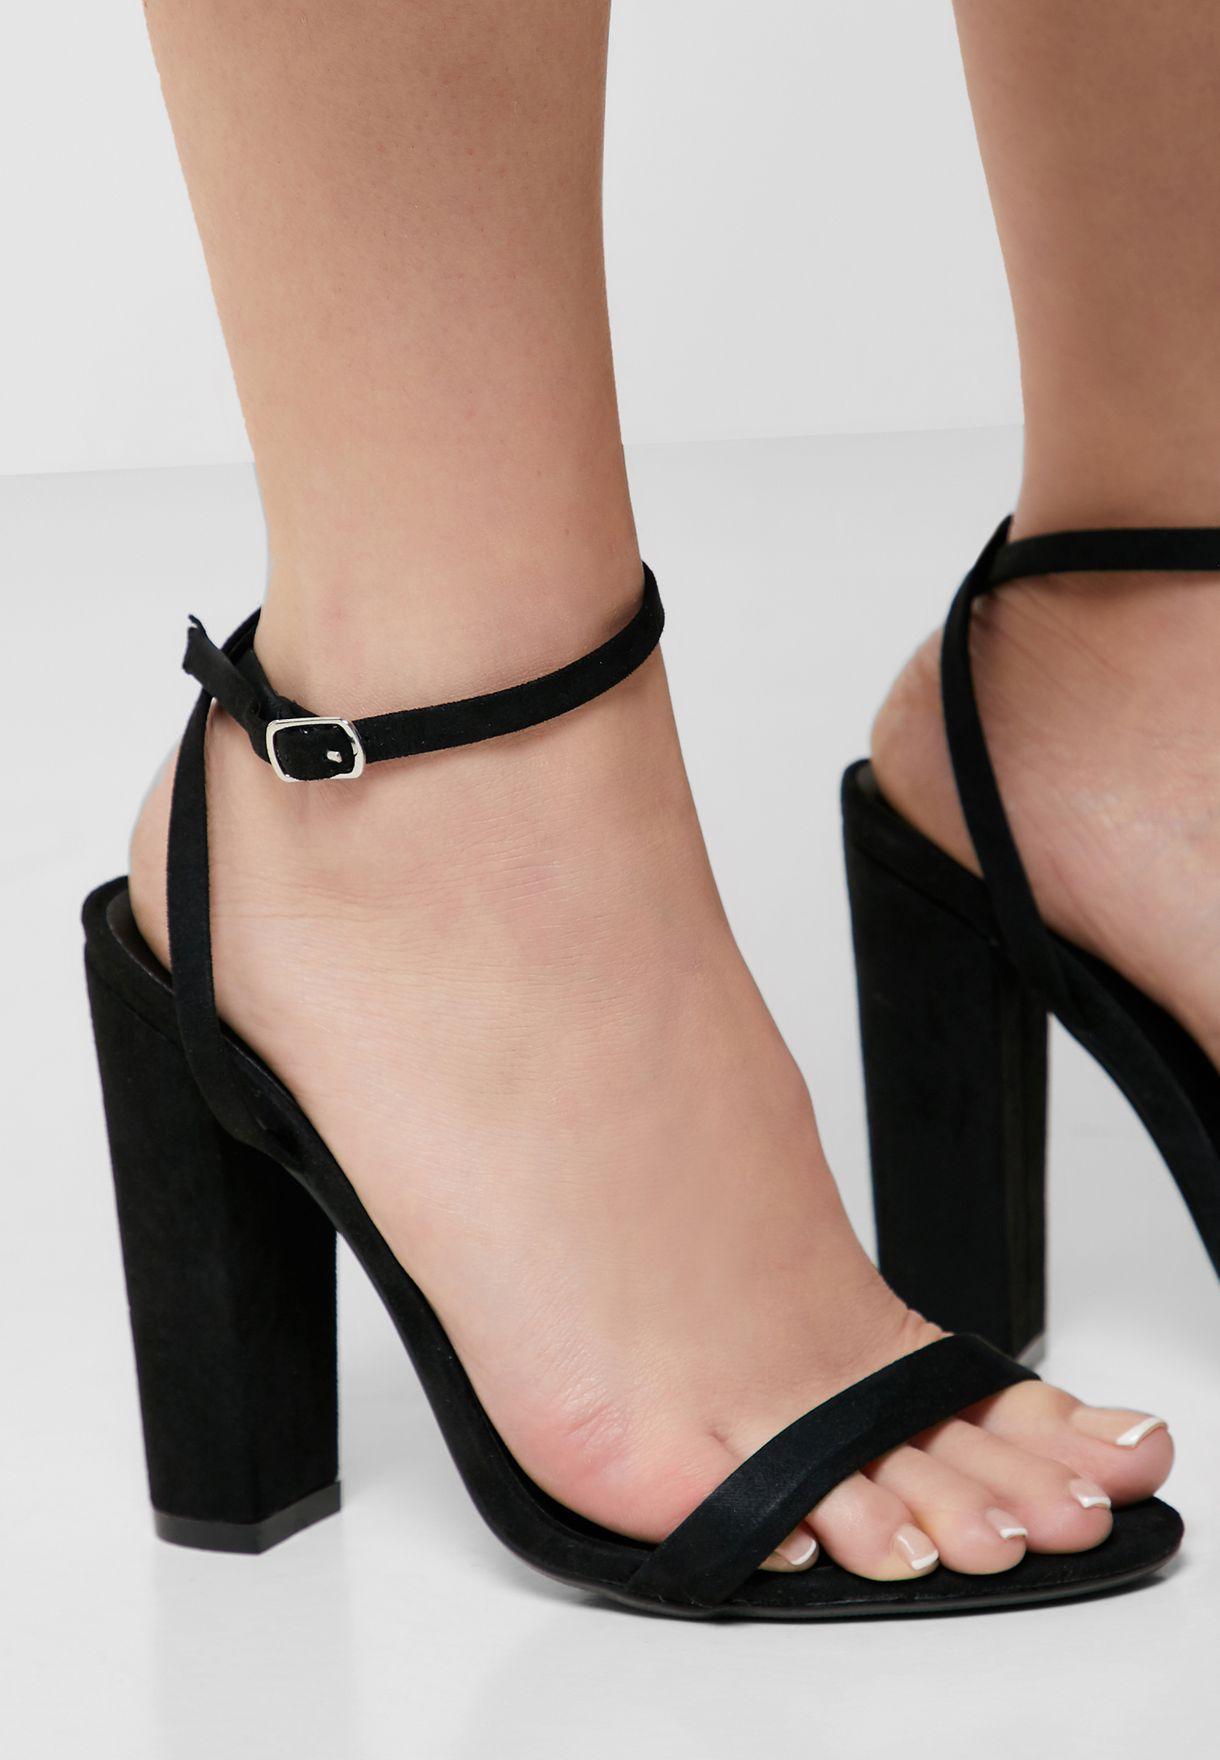 Entry Block Heeled Sandal - Black